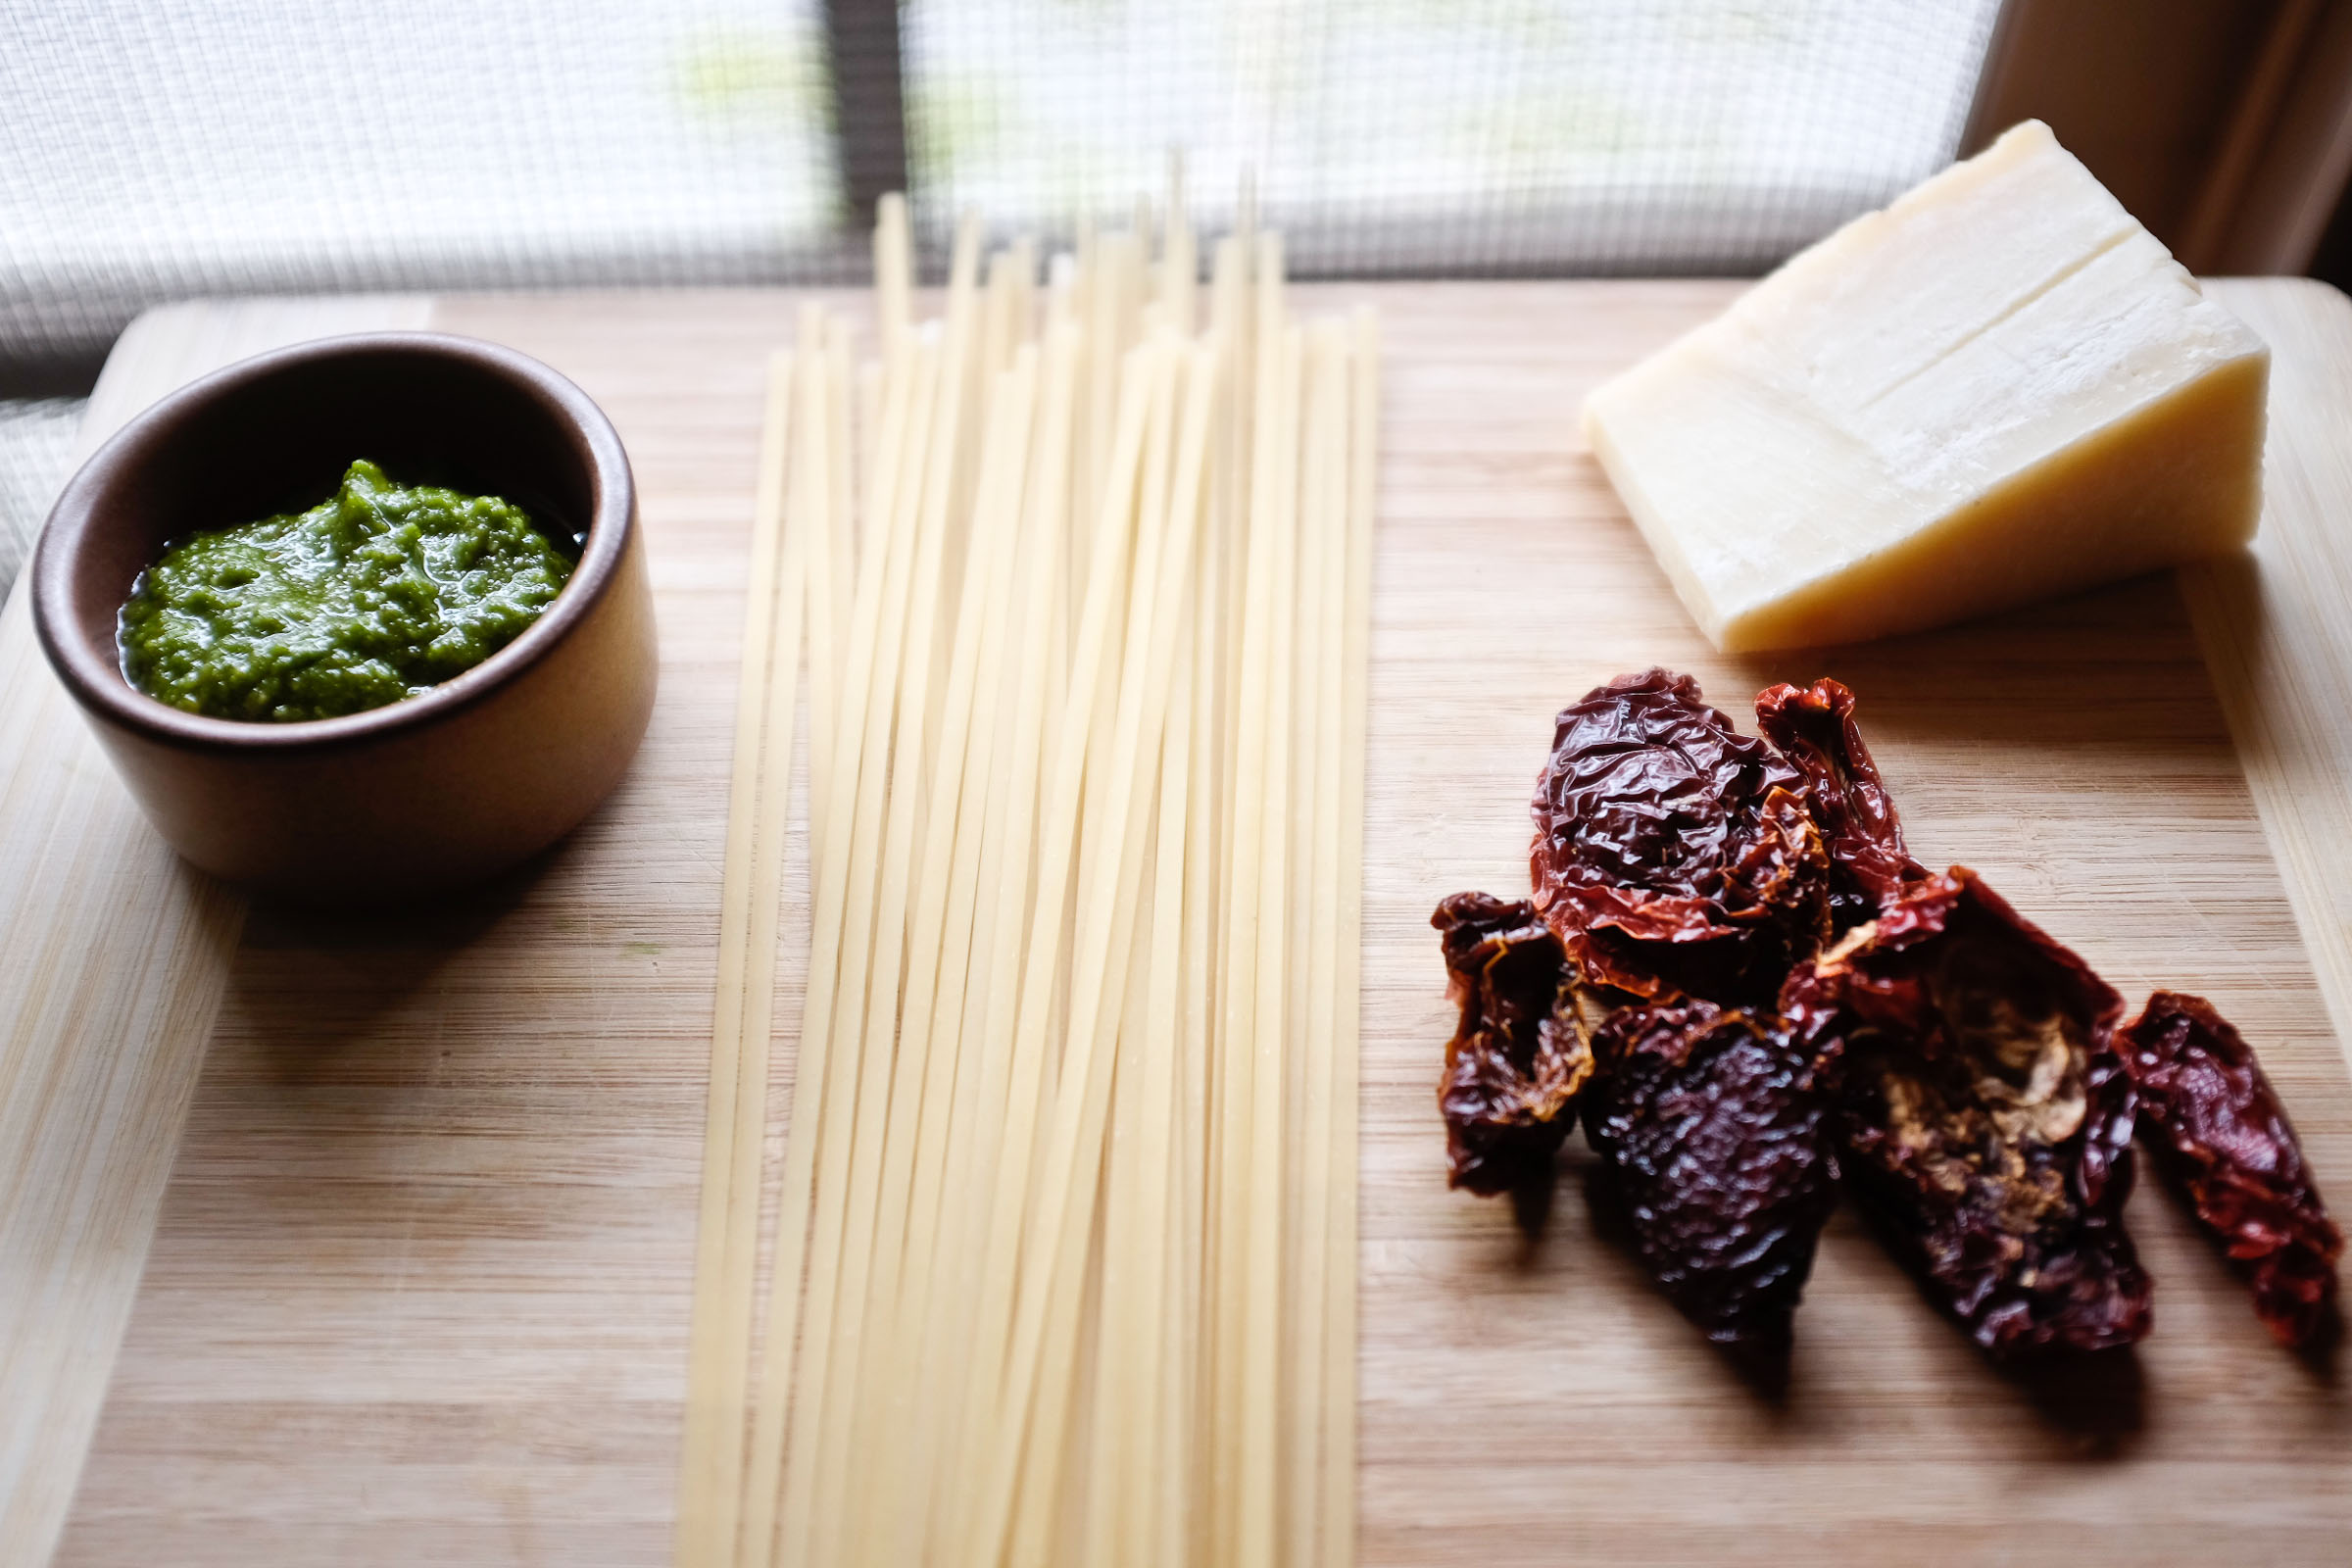 Linguine with Almond-Kale Pesto